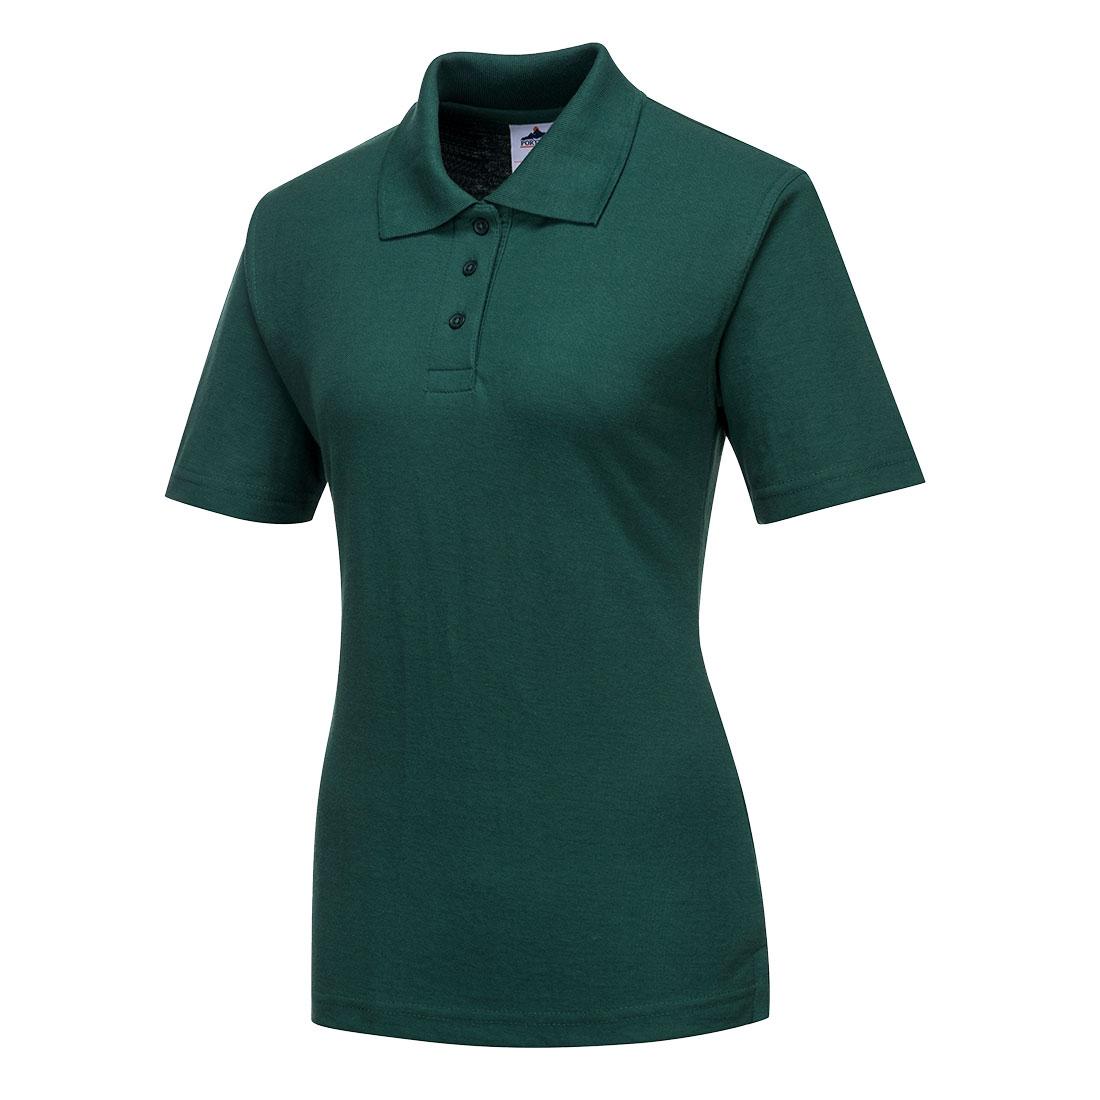 Ladies Polo Shirt Bottle Green XXLR